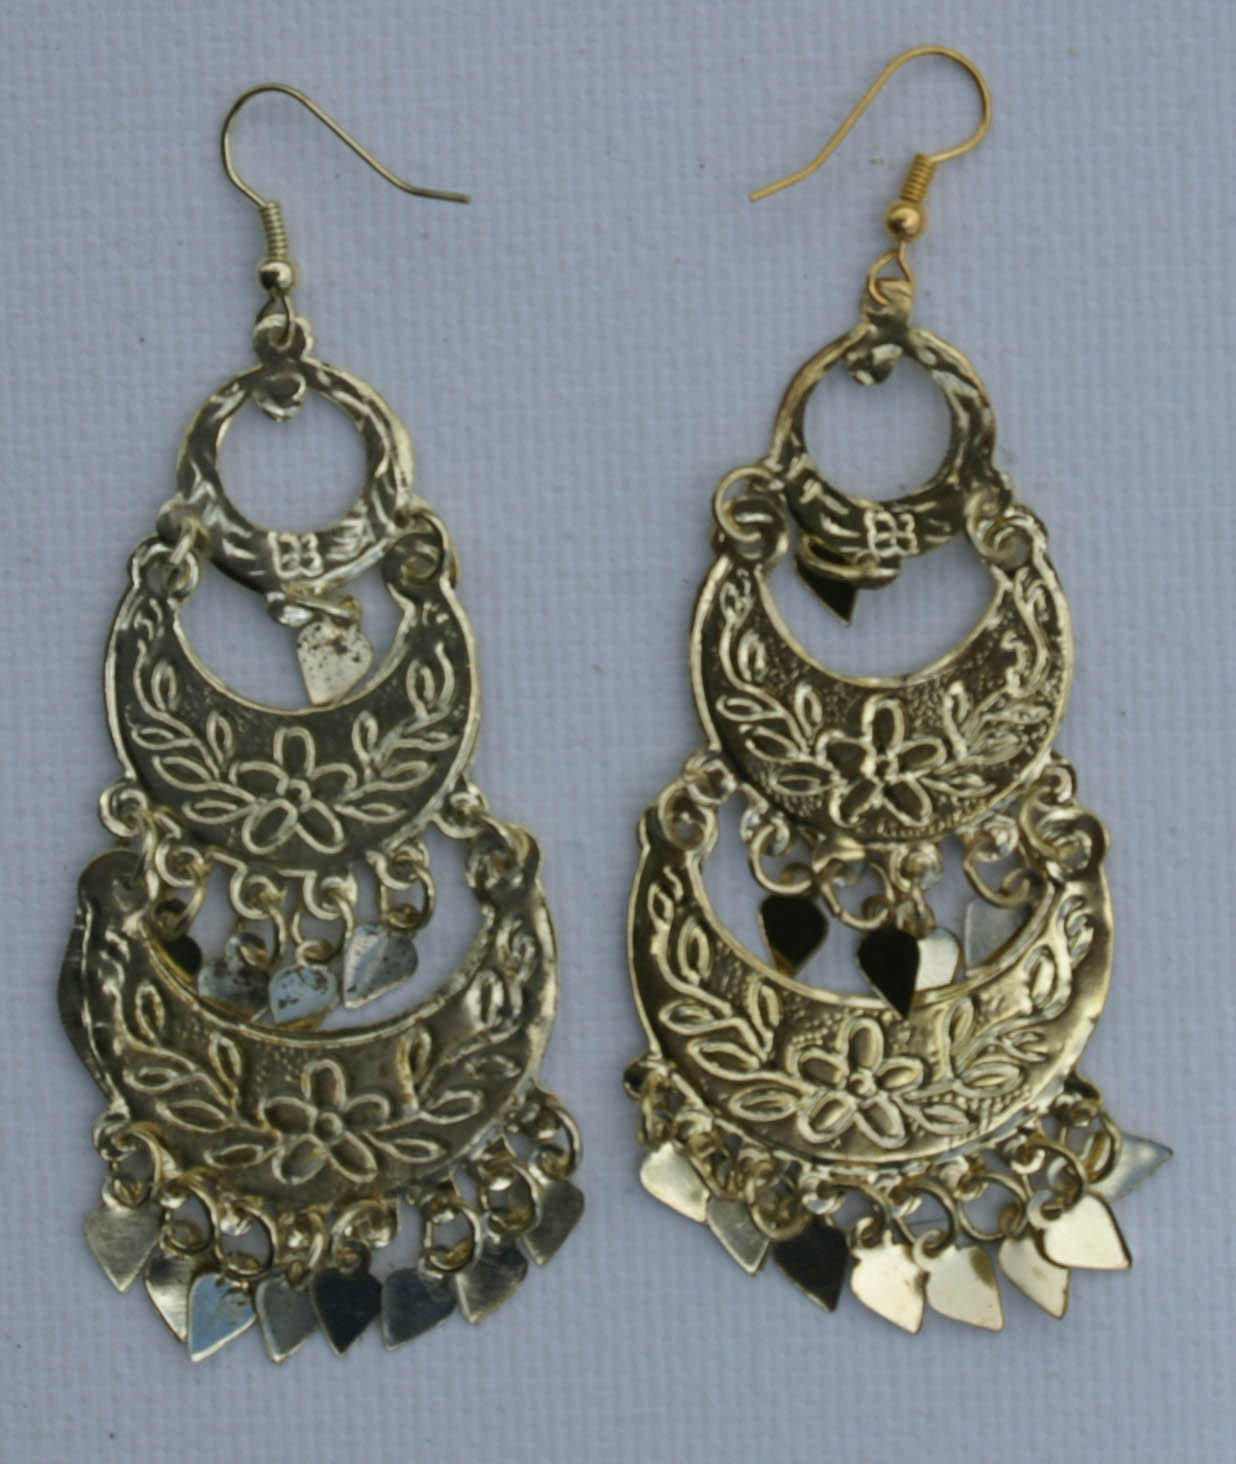 ee6c072c865d Aretes egipcios hechos de metal amarillo bisuteria etnica -  4.50 ...